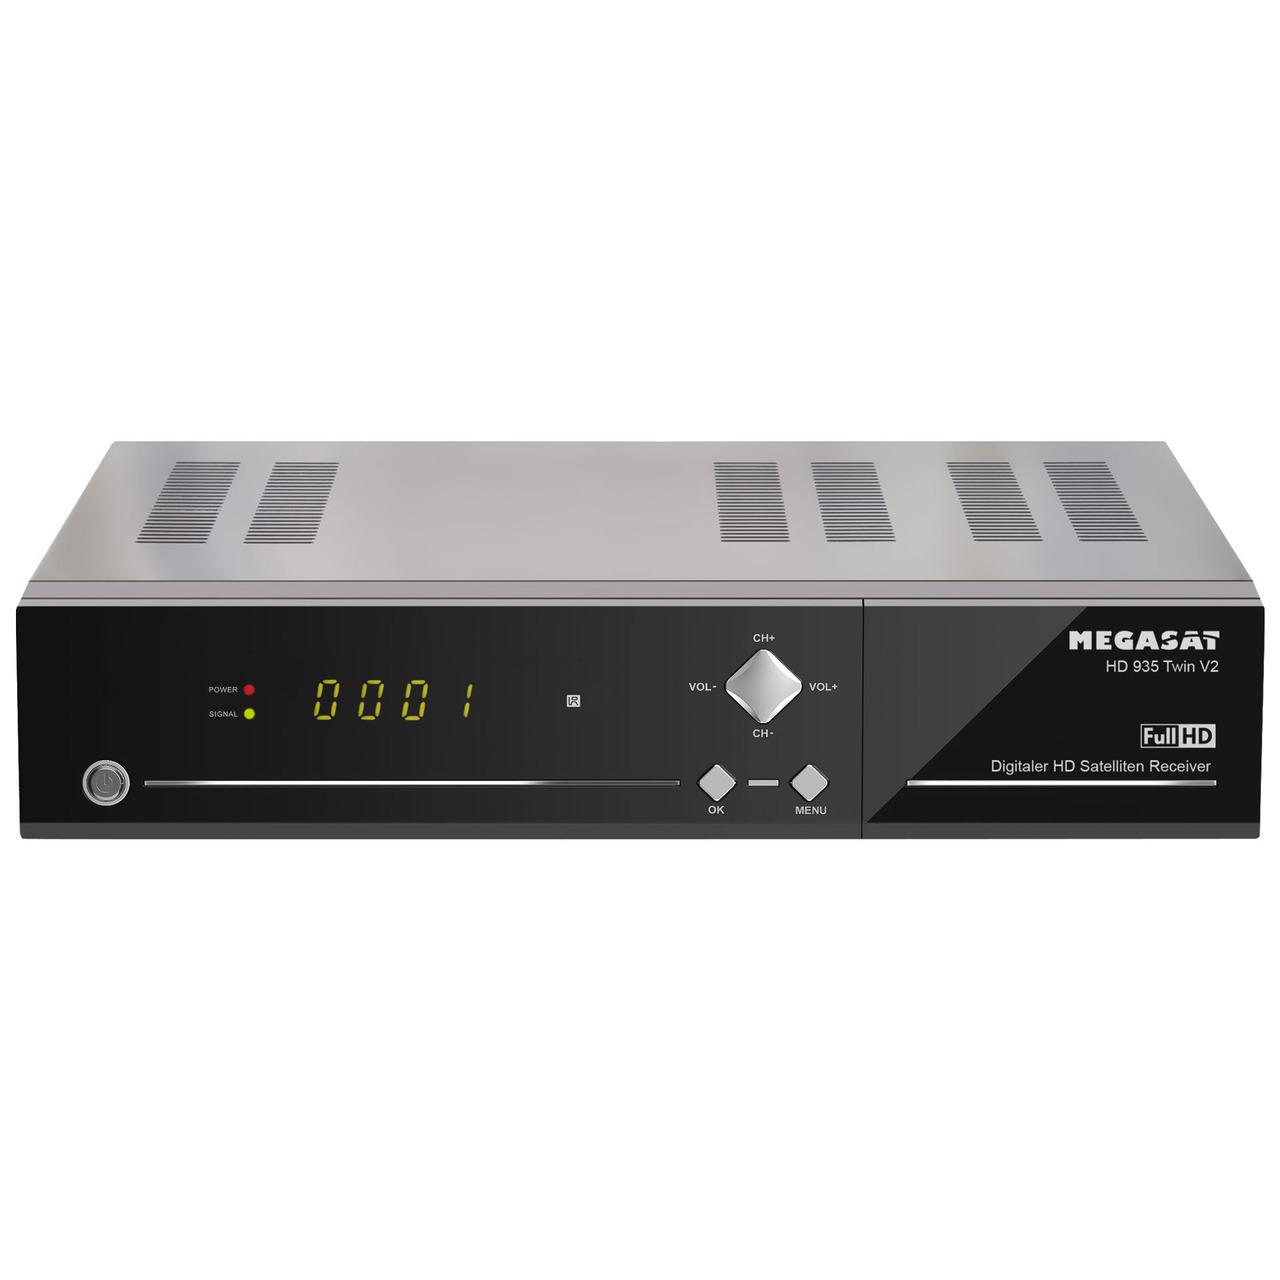 Megasat Twin-Sat-Receiver HD 935 Twin V2- mit 2-5-Festplatteneinschub- 1080p-Full-HD- App-Steuerung